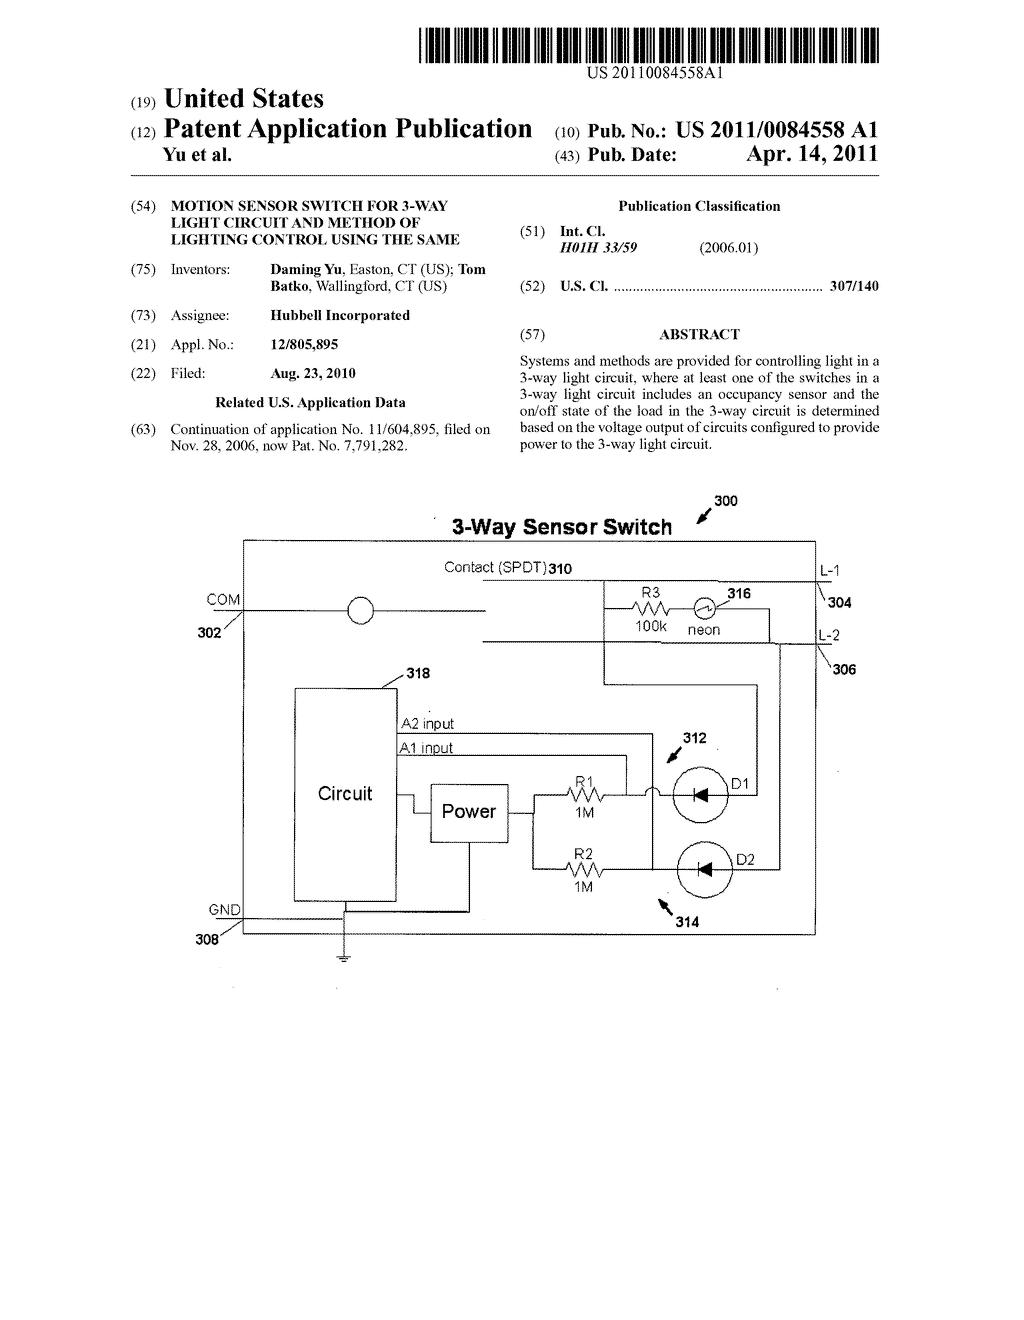 20110084558_01?resize\\\=665%2C857 hd wallpapers hpm motion sensor wiring diagram hdigdg tk hpm motion sensor wiring diagram at virtualis.co